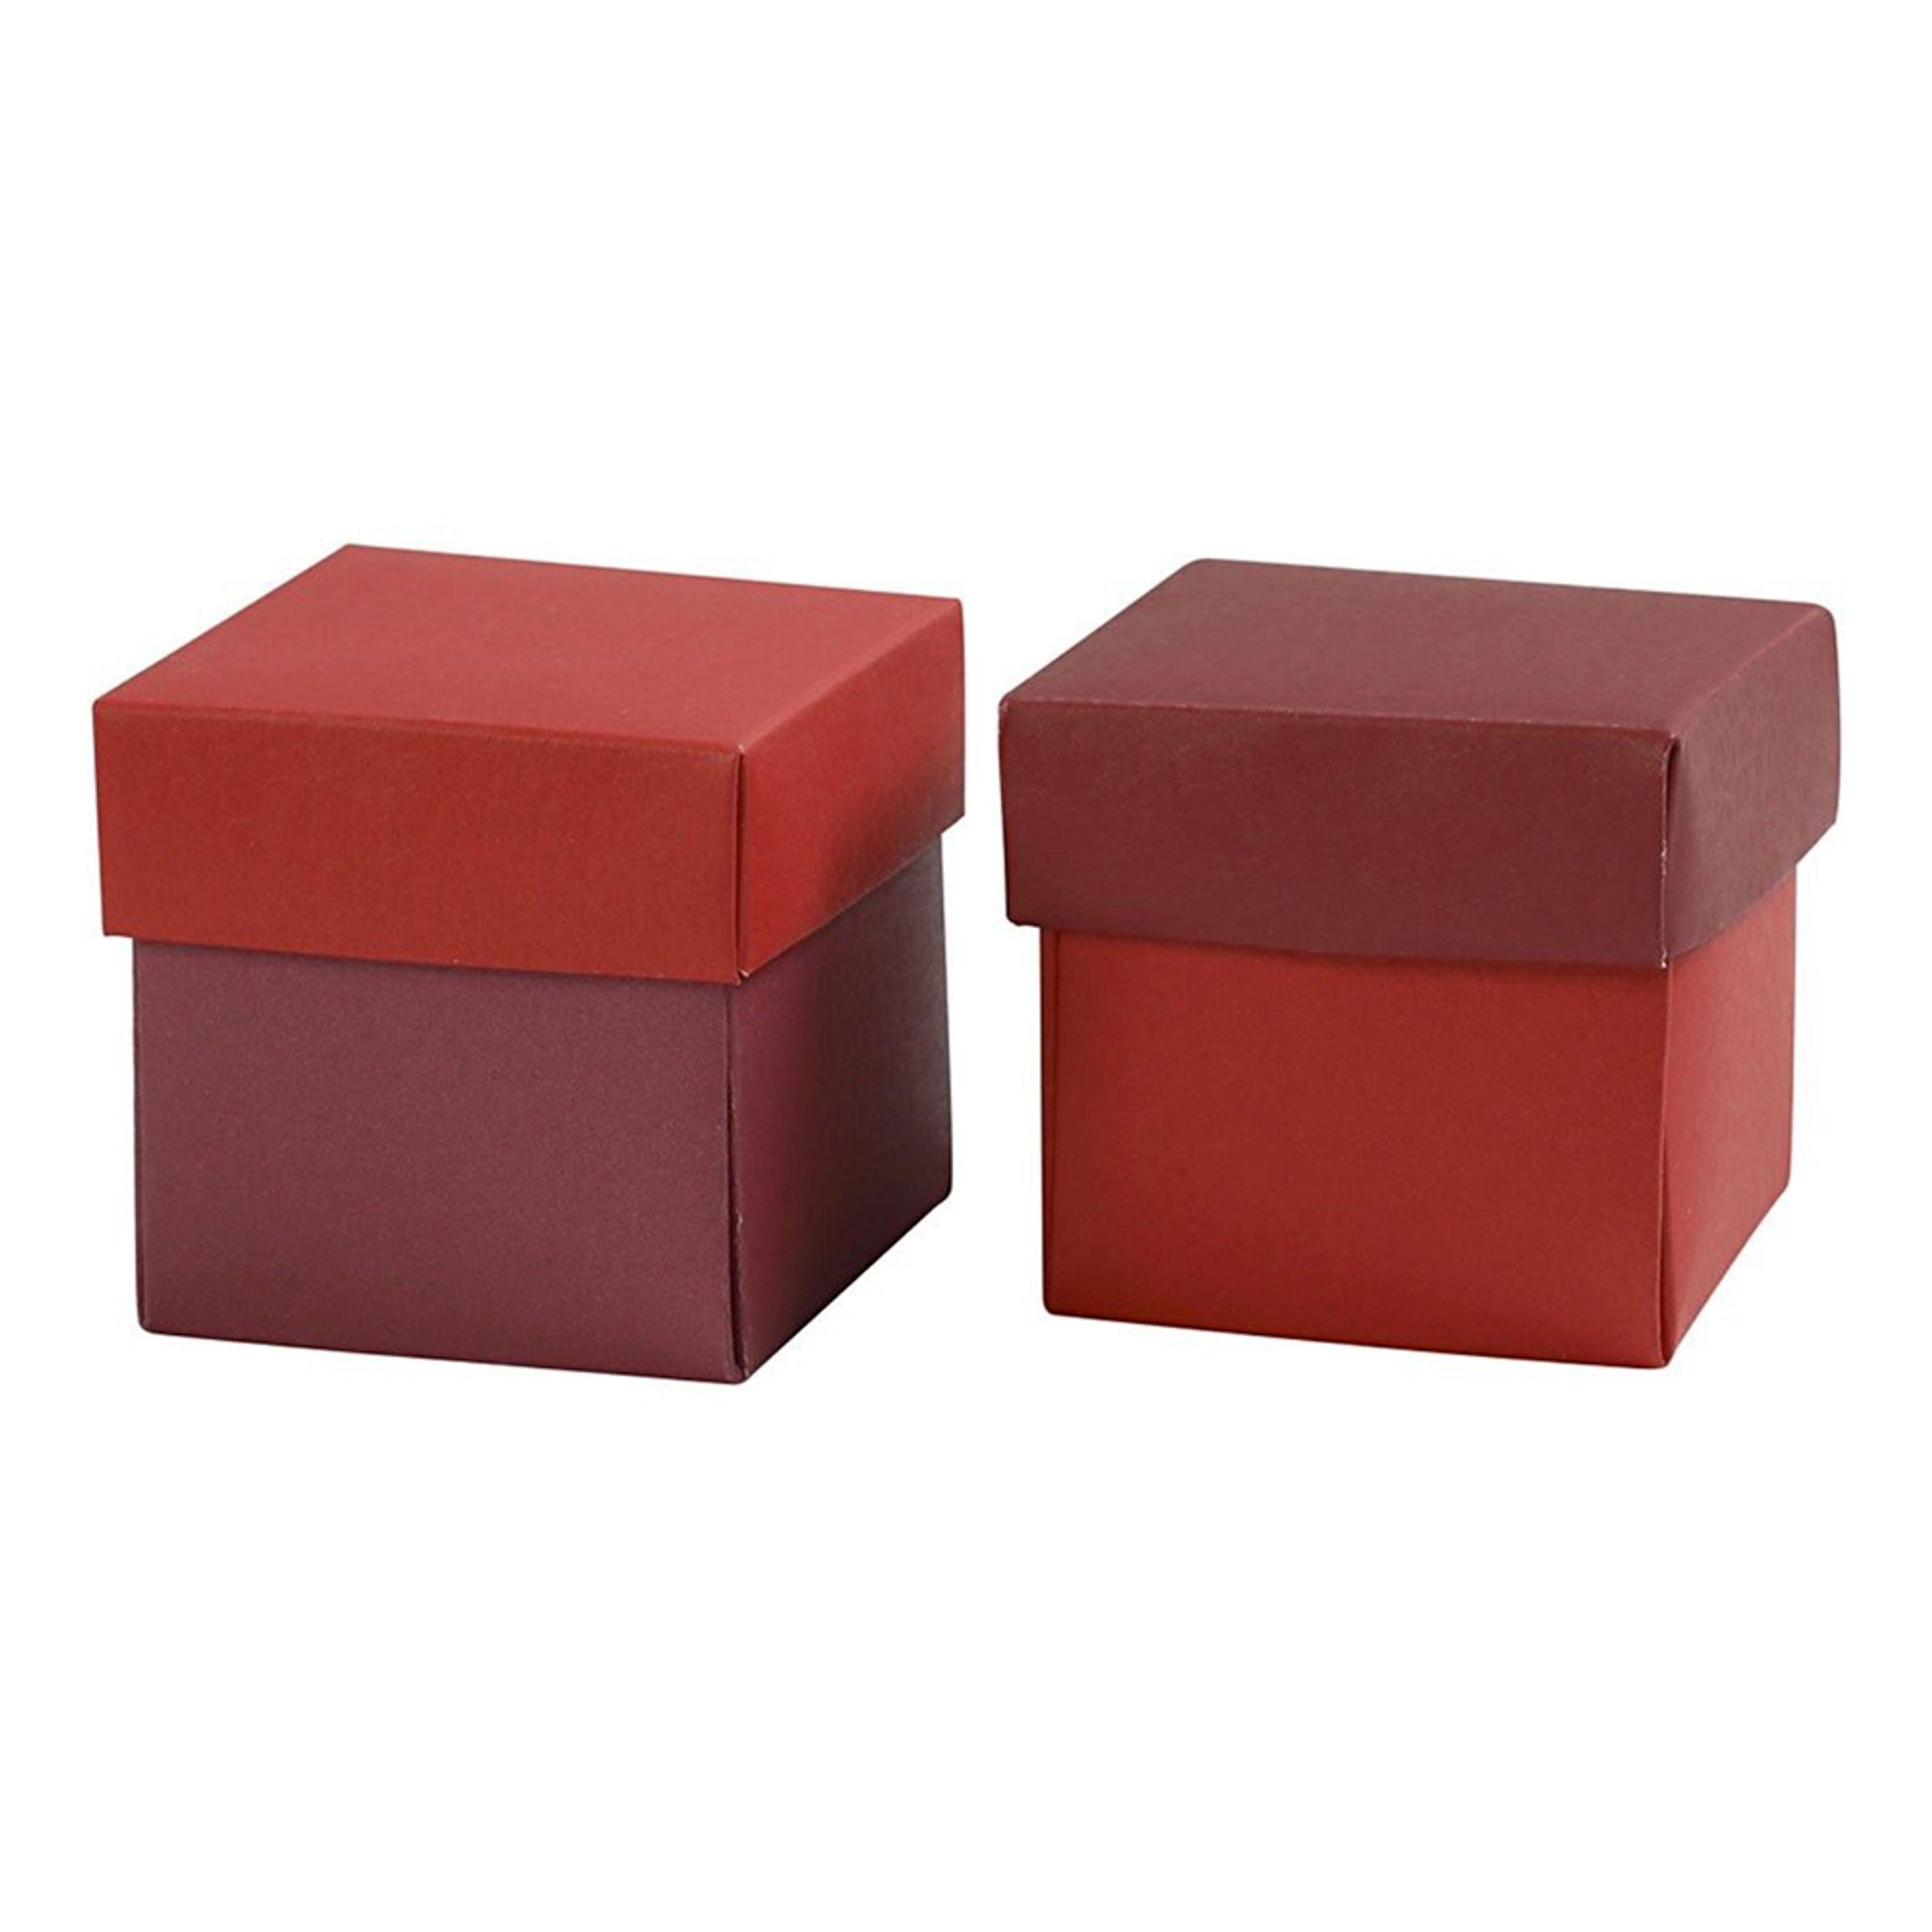 Cc Gaveesker Rød/Vinrød - 10-pakning